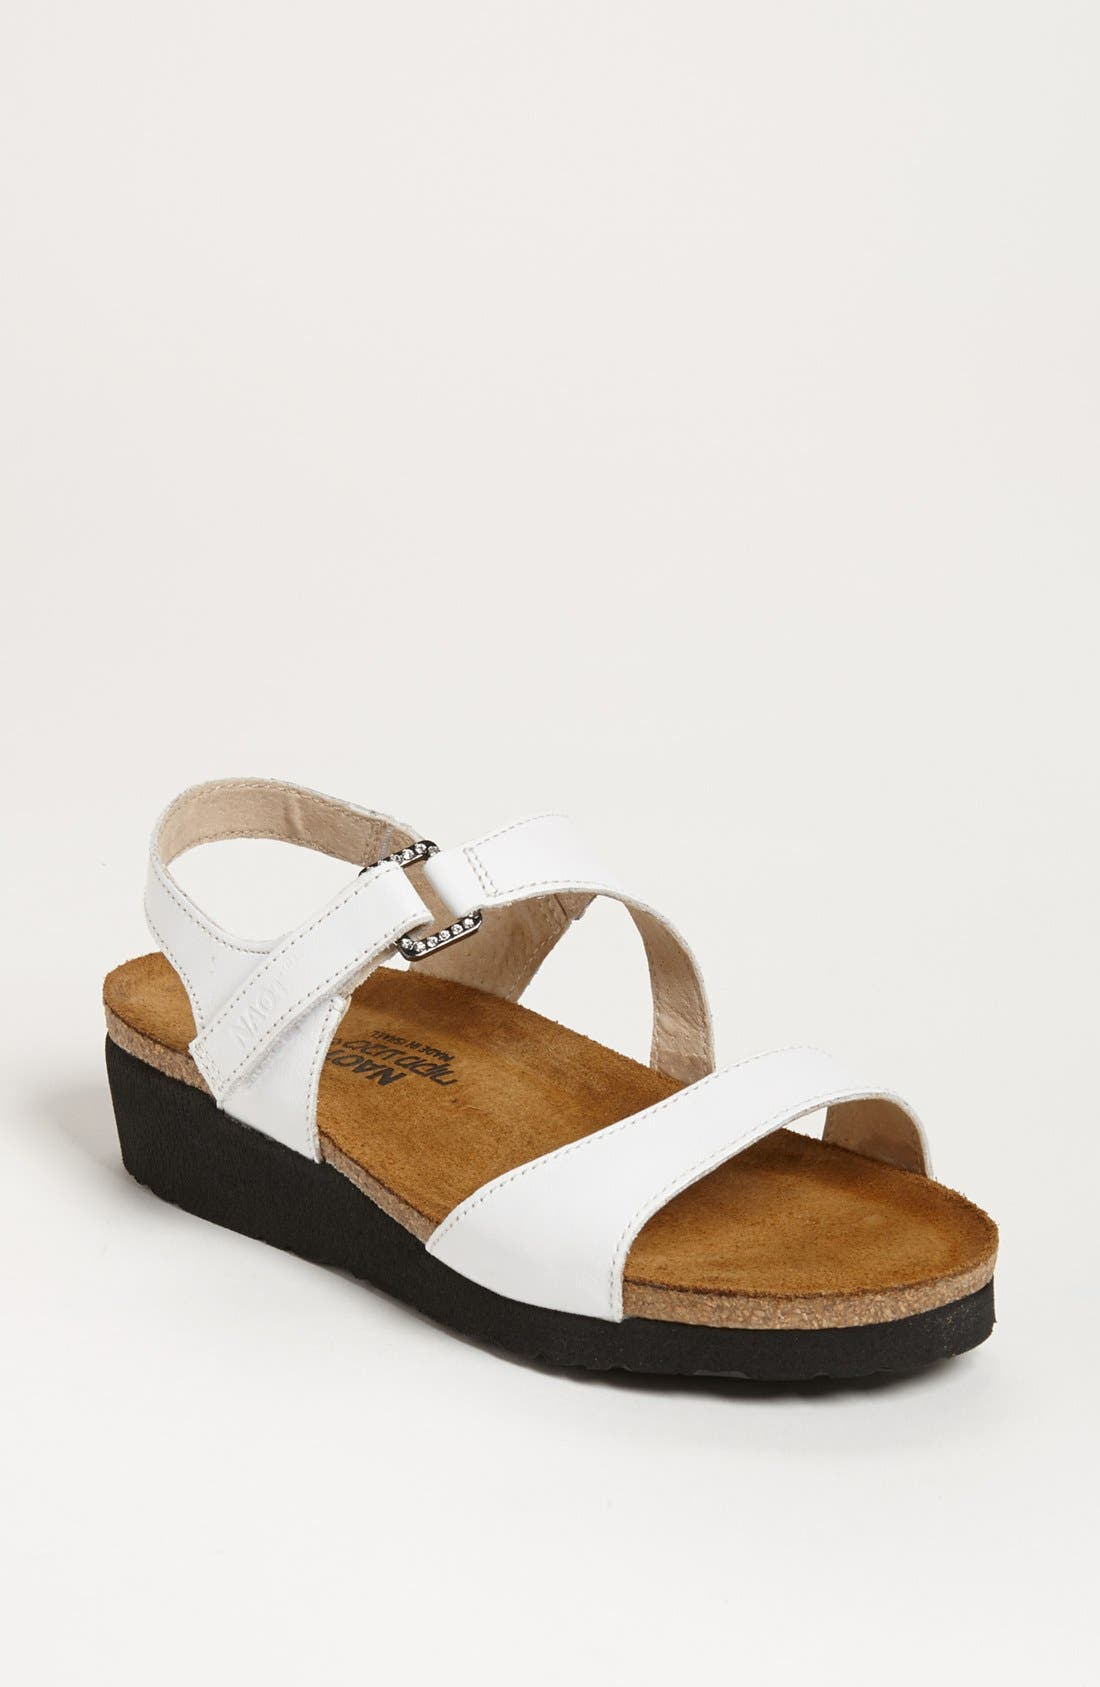 Alternate Image 1 Selected - Naot 'Pamela' Sandal